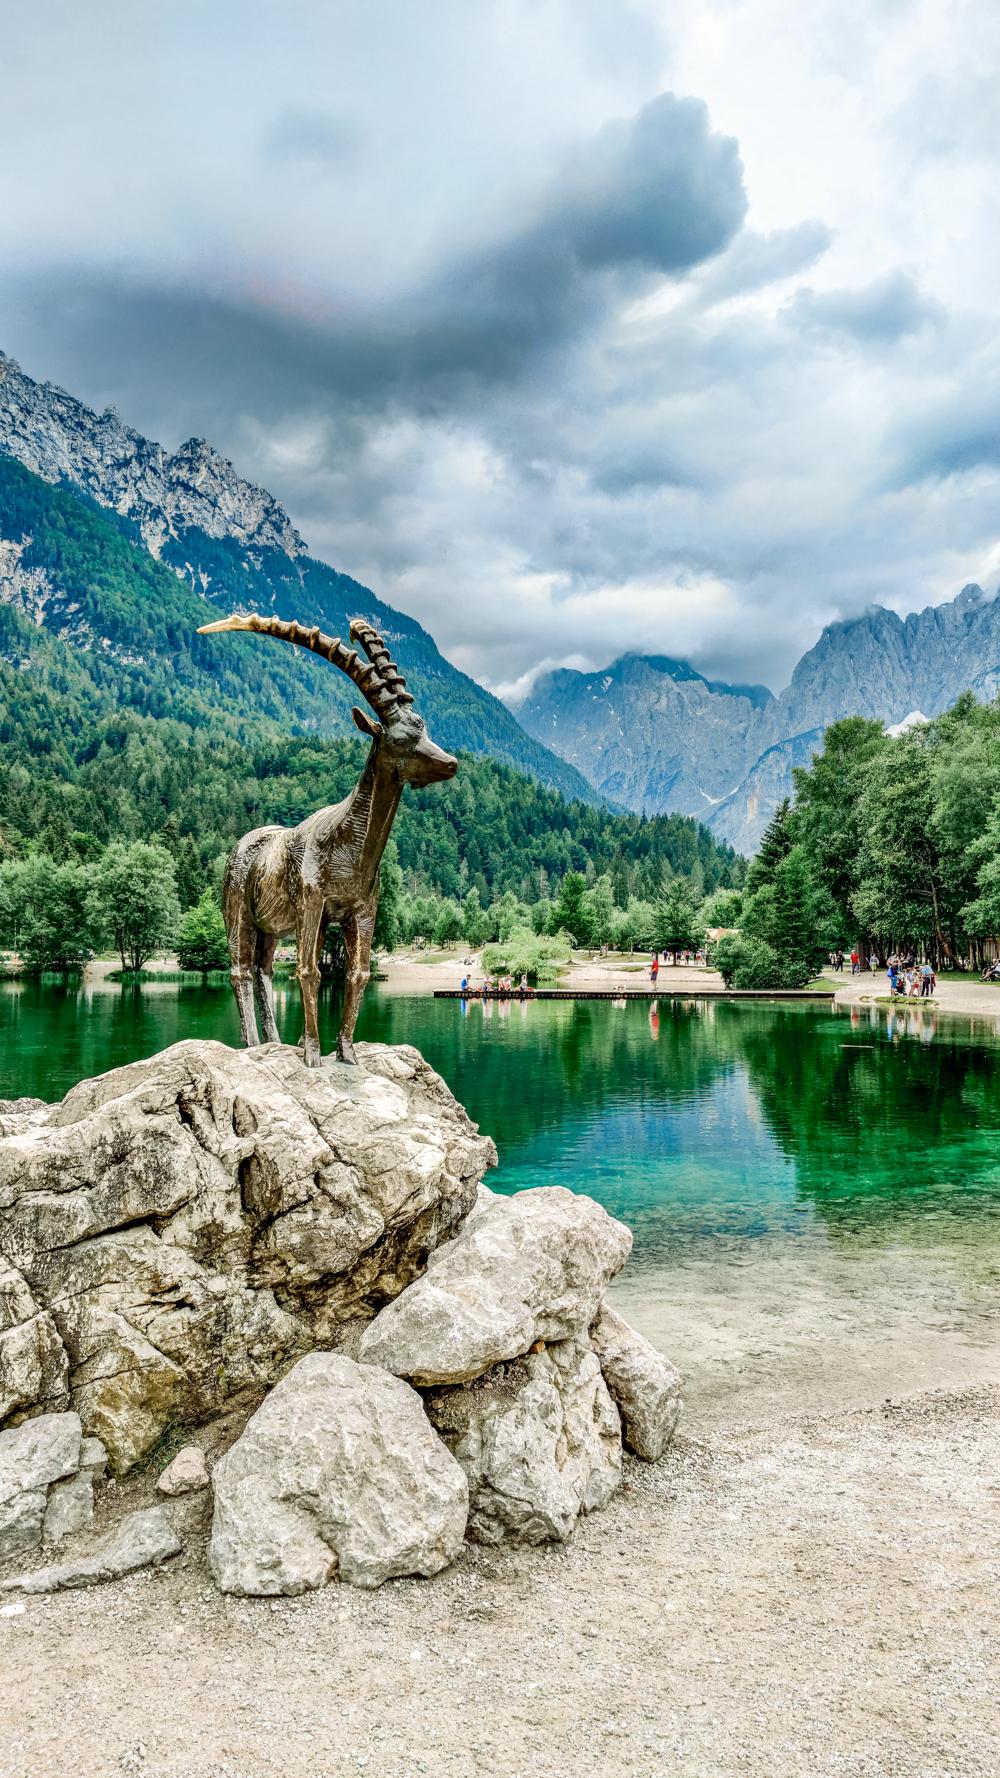 Lake Jasna and the Alpine ibex called Zlatorog - 4-day Slovenia travel itinerary for the best outdoor adventures | Aliz's Wonderland